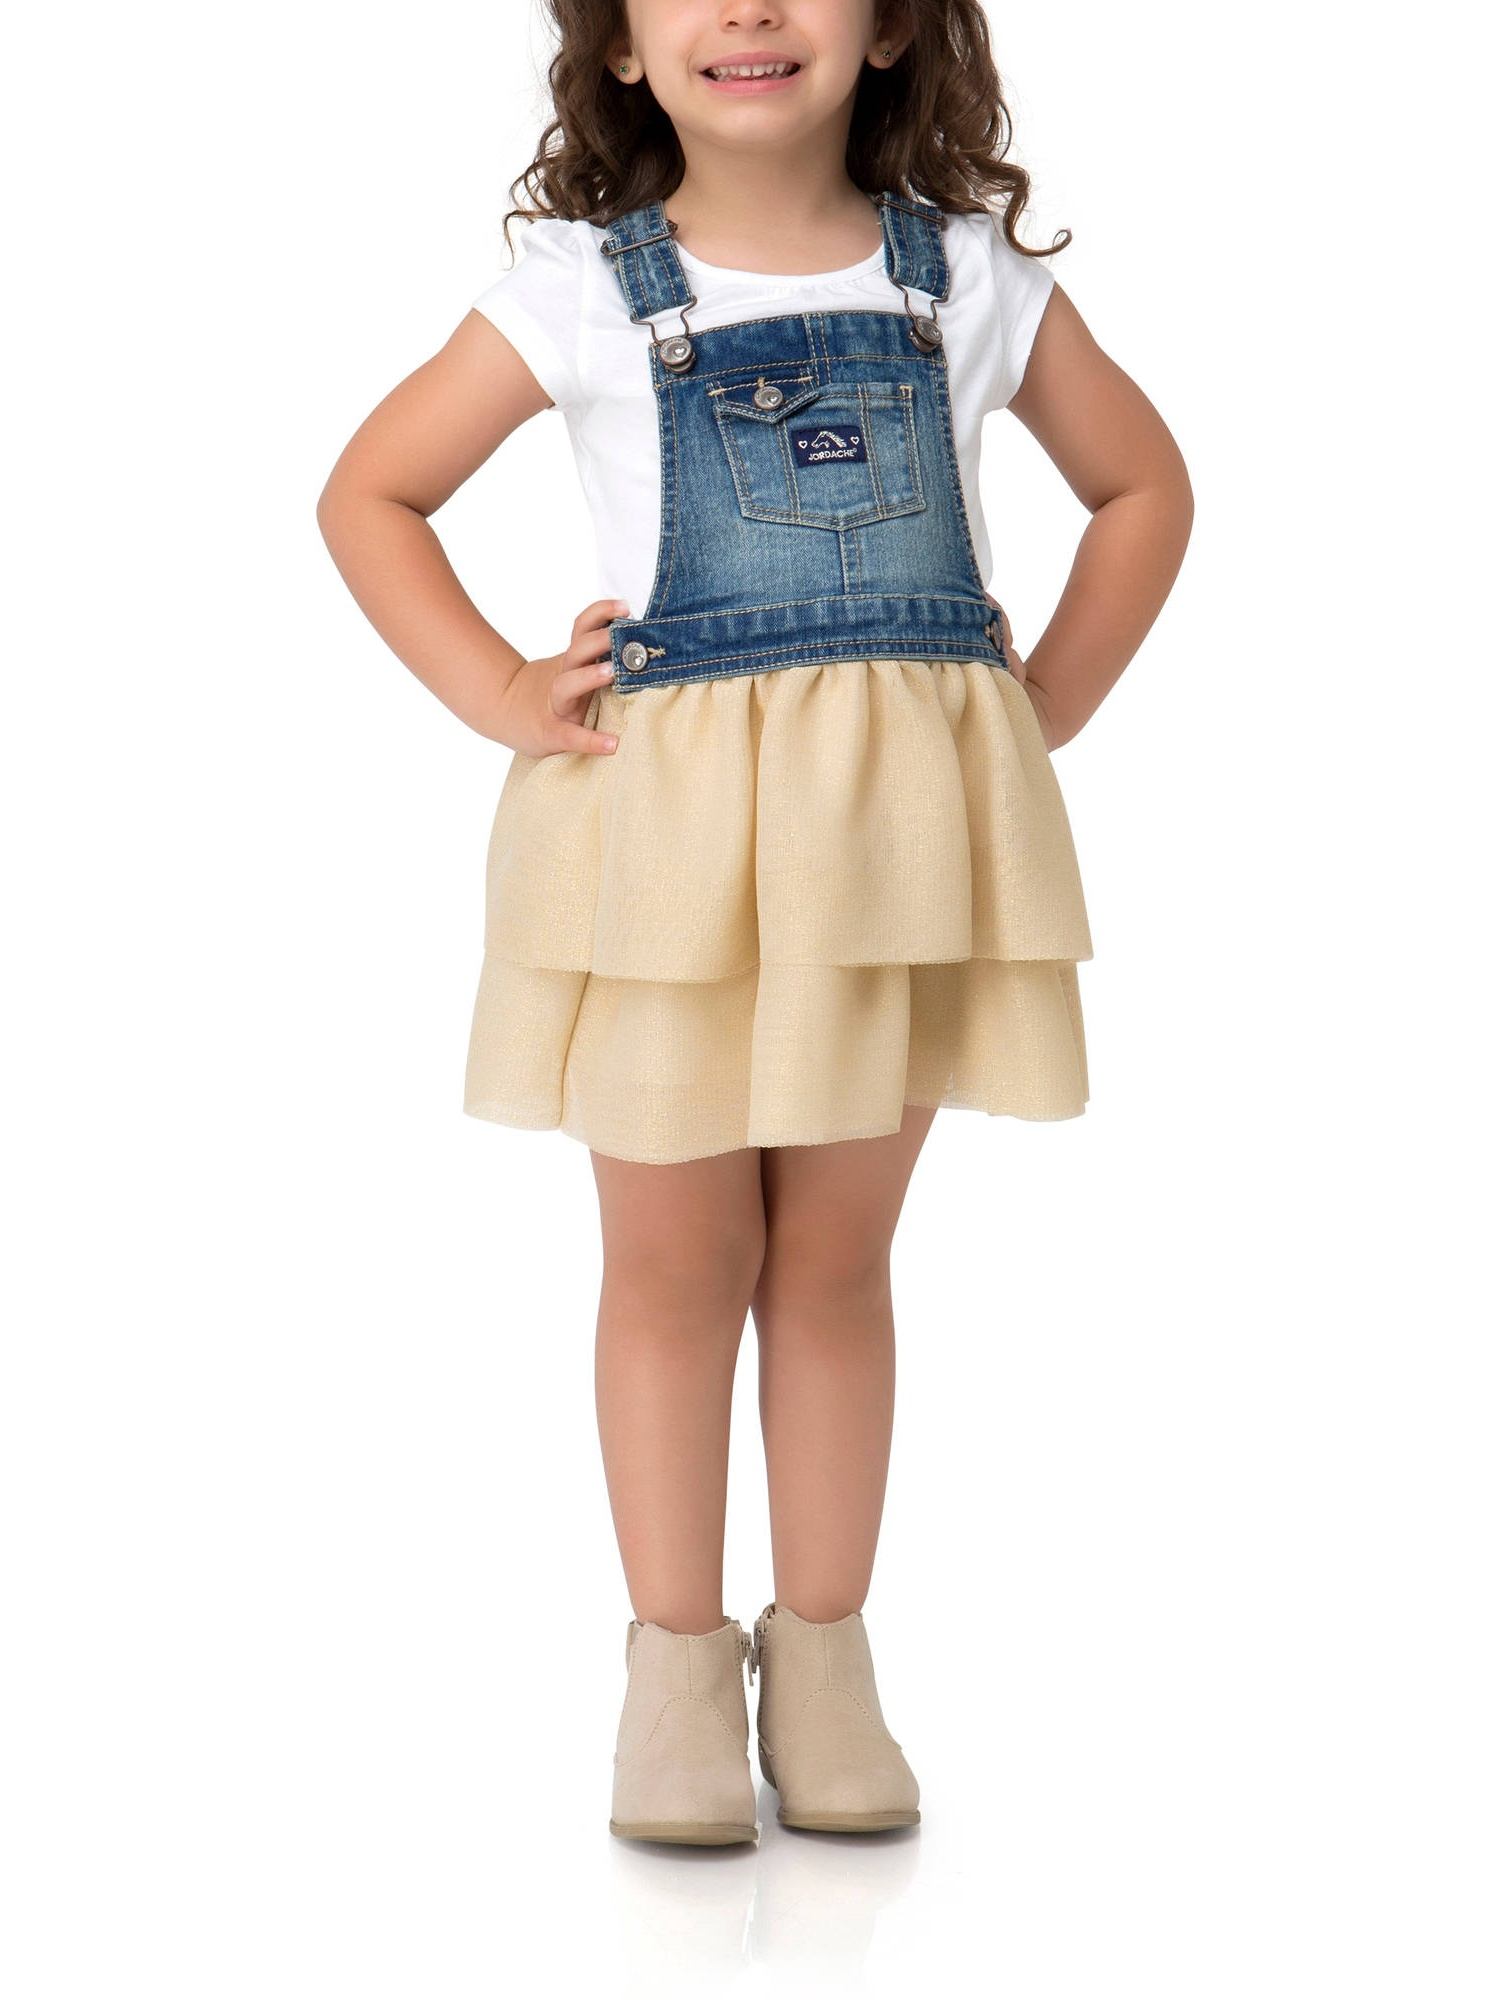 Toddler Girl Tiered Ruffle Skirtall